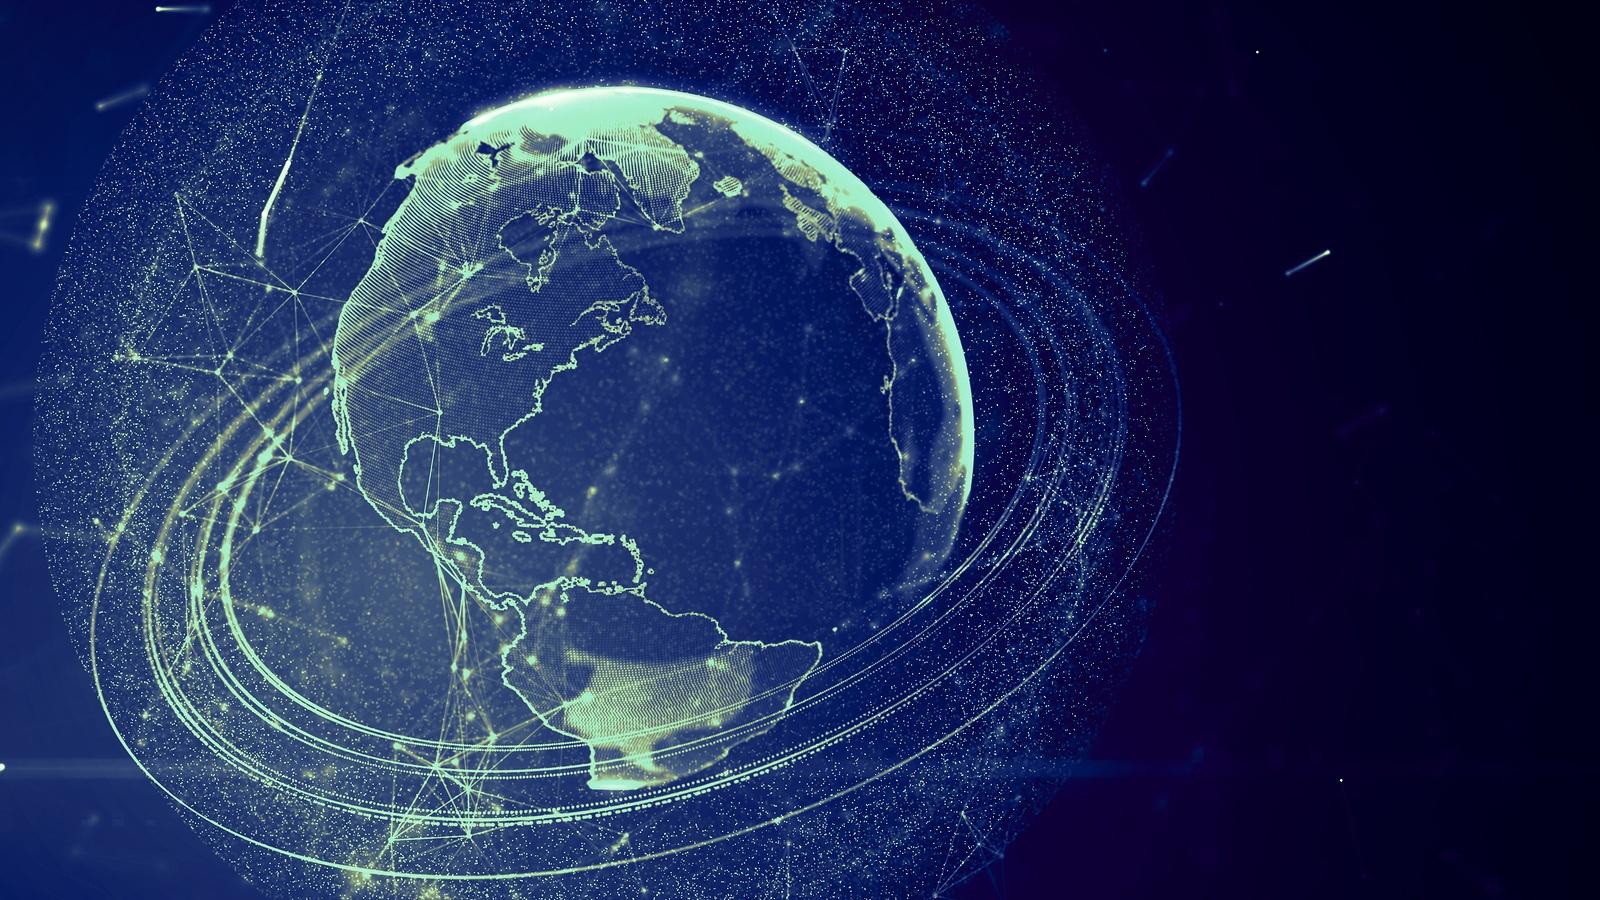 bigstock-Detailed-Virtual-Planet-Earth-92821004.jpg